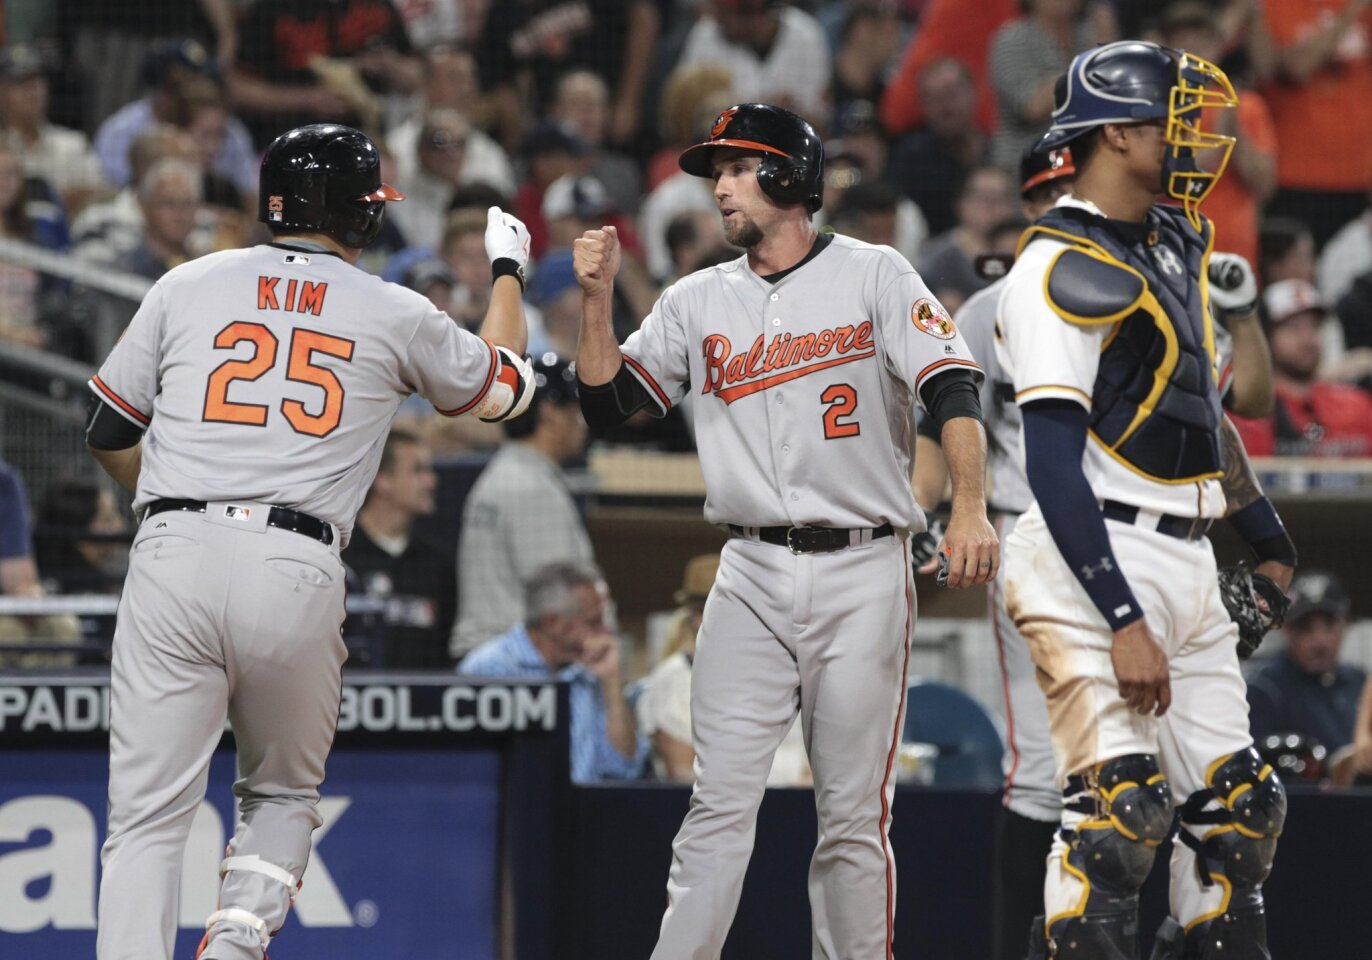 Padres vs. Orioles 6/28/16